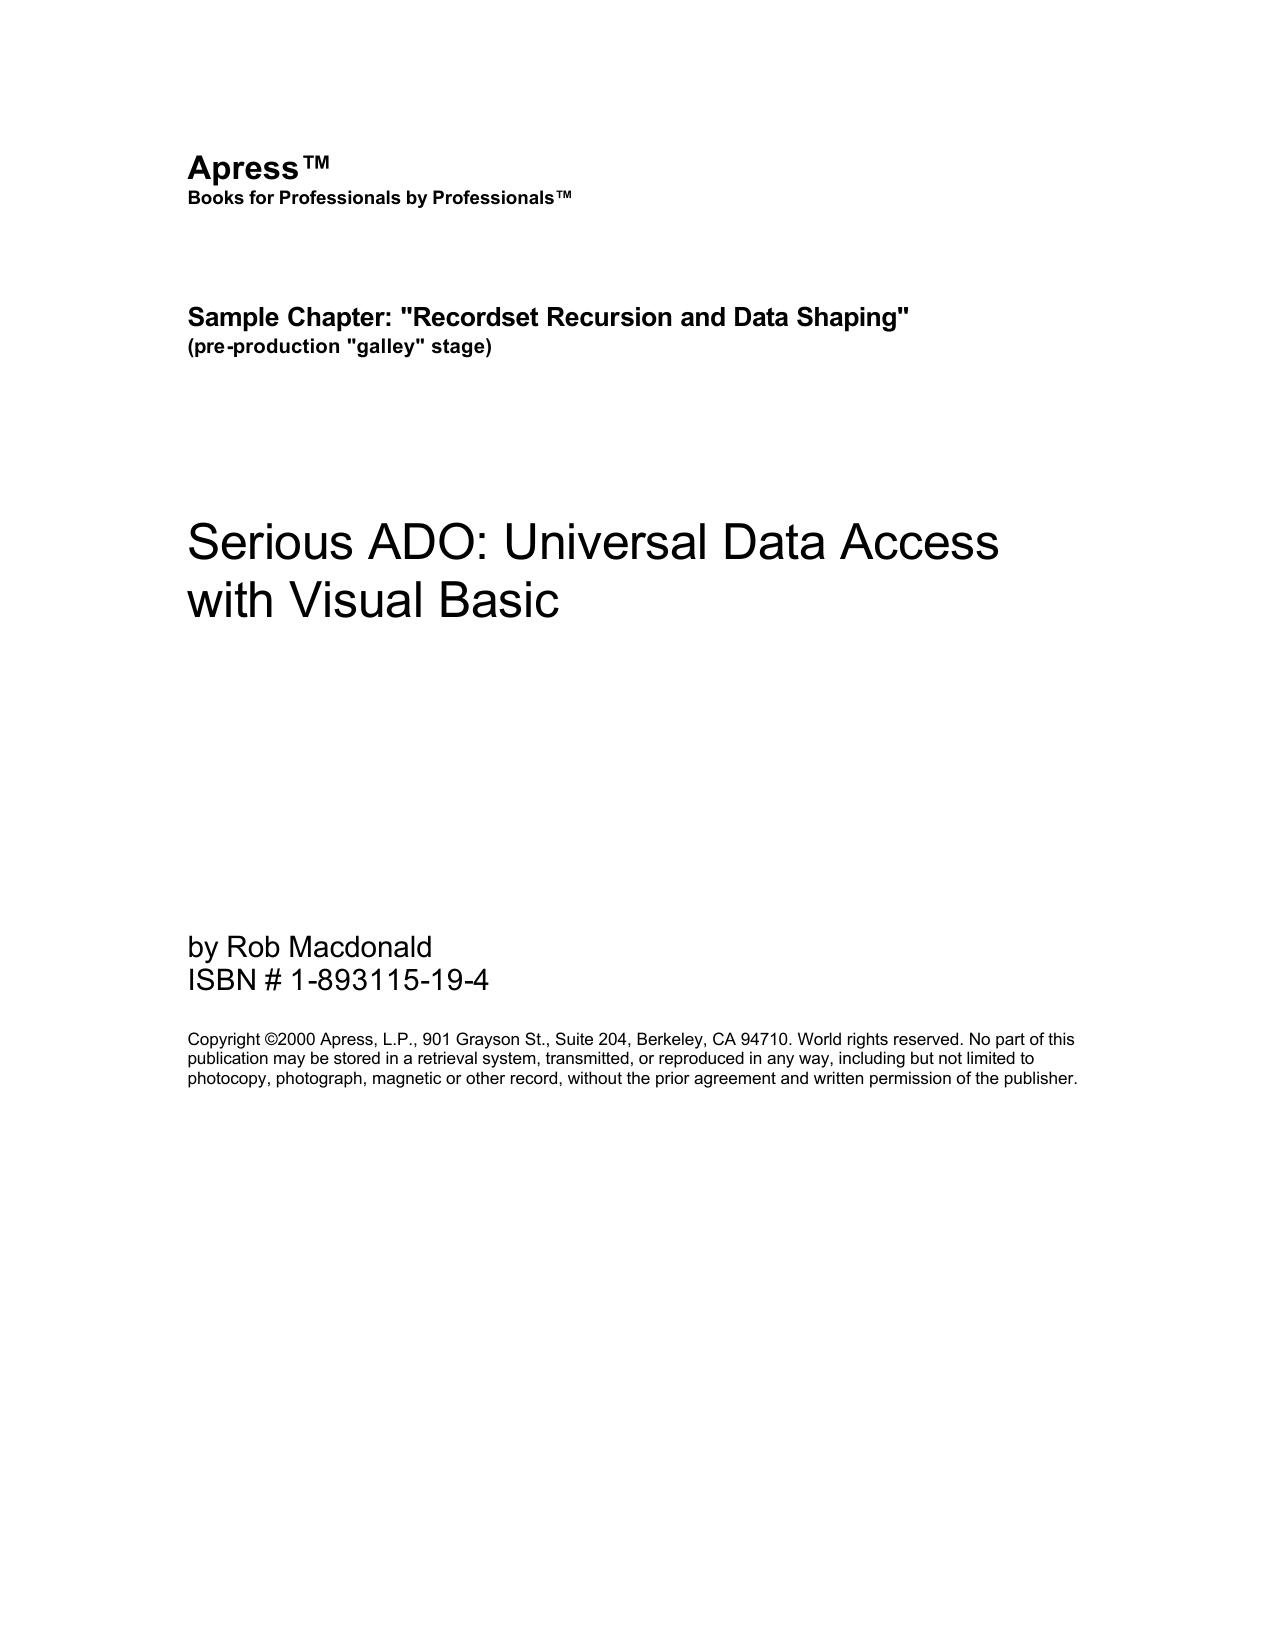 Serious ADO: Universal Data Access with Visual Basic Apress™